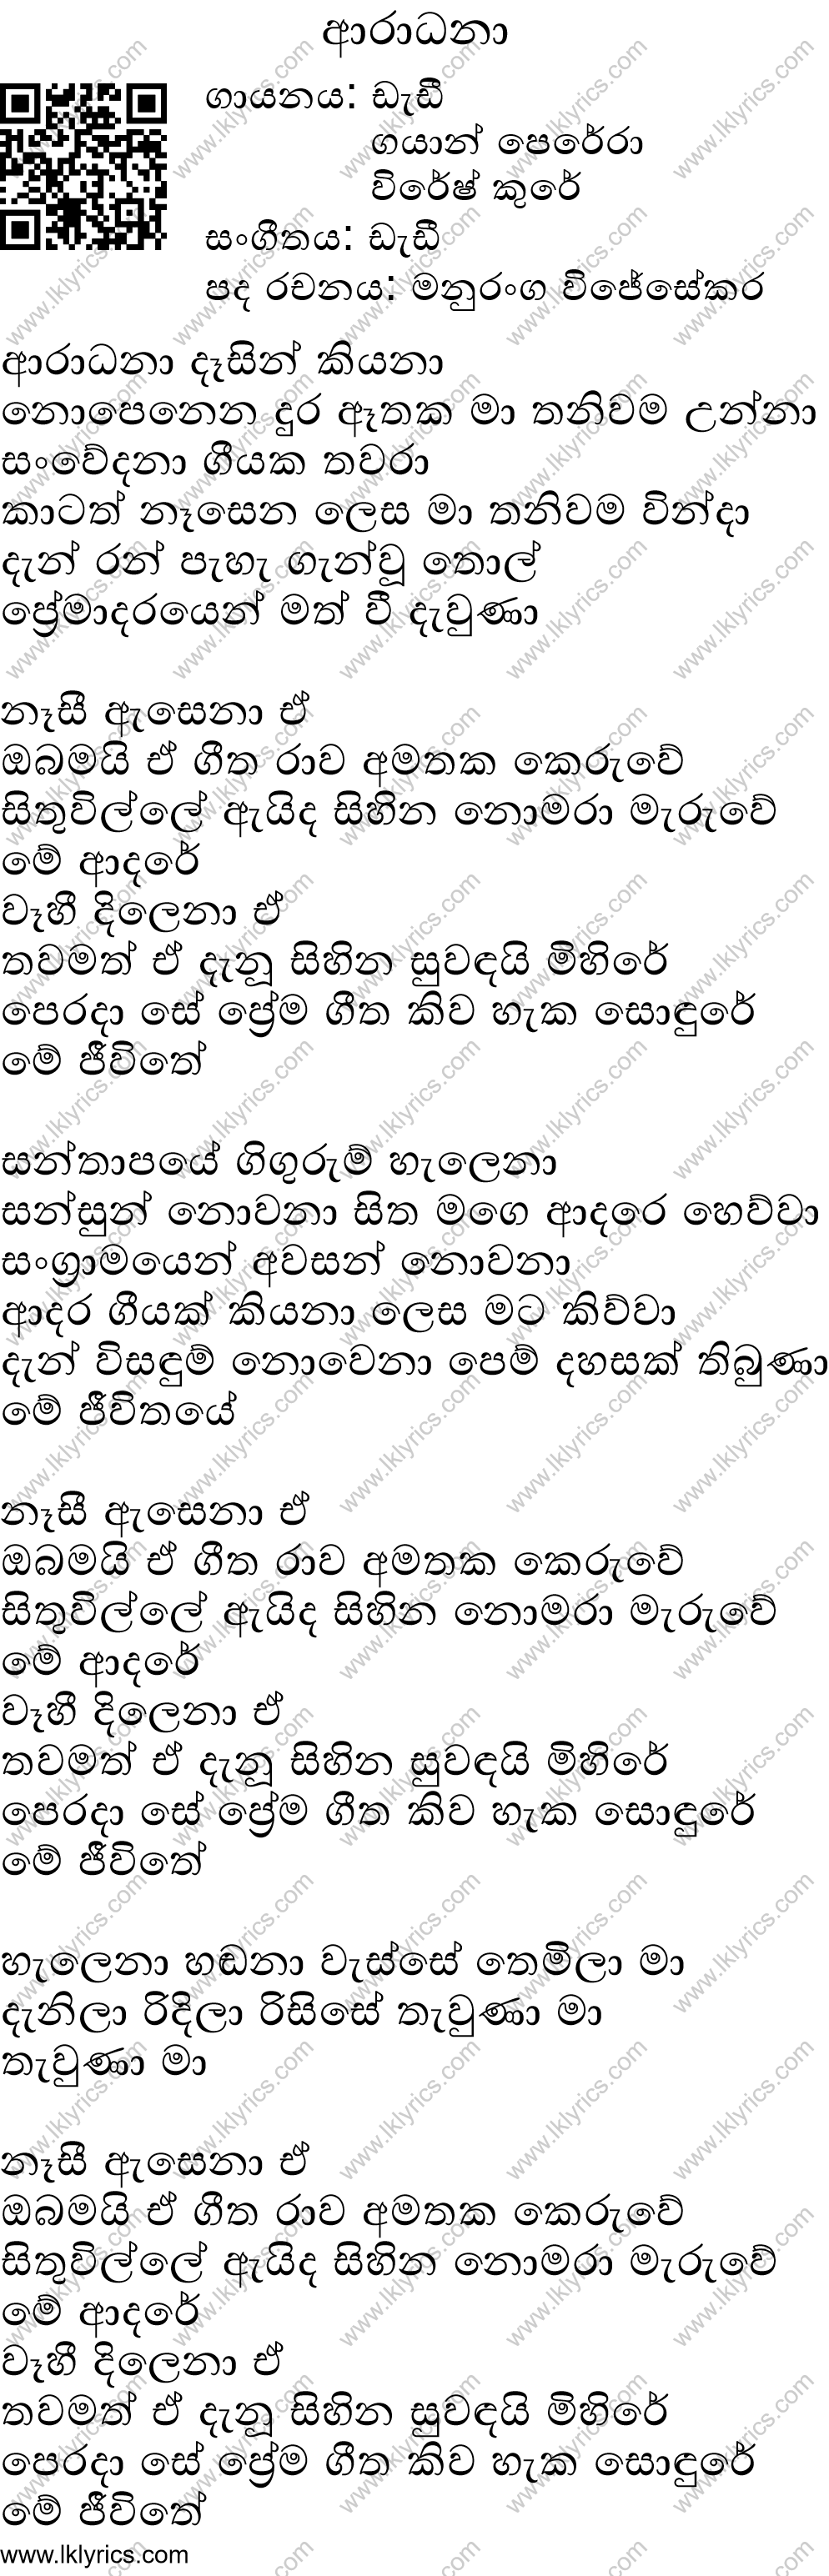 Aradhana - All Songs Lyrics & Videos